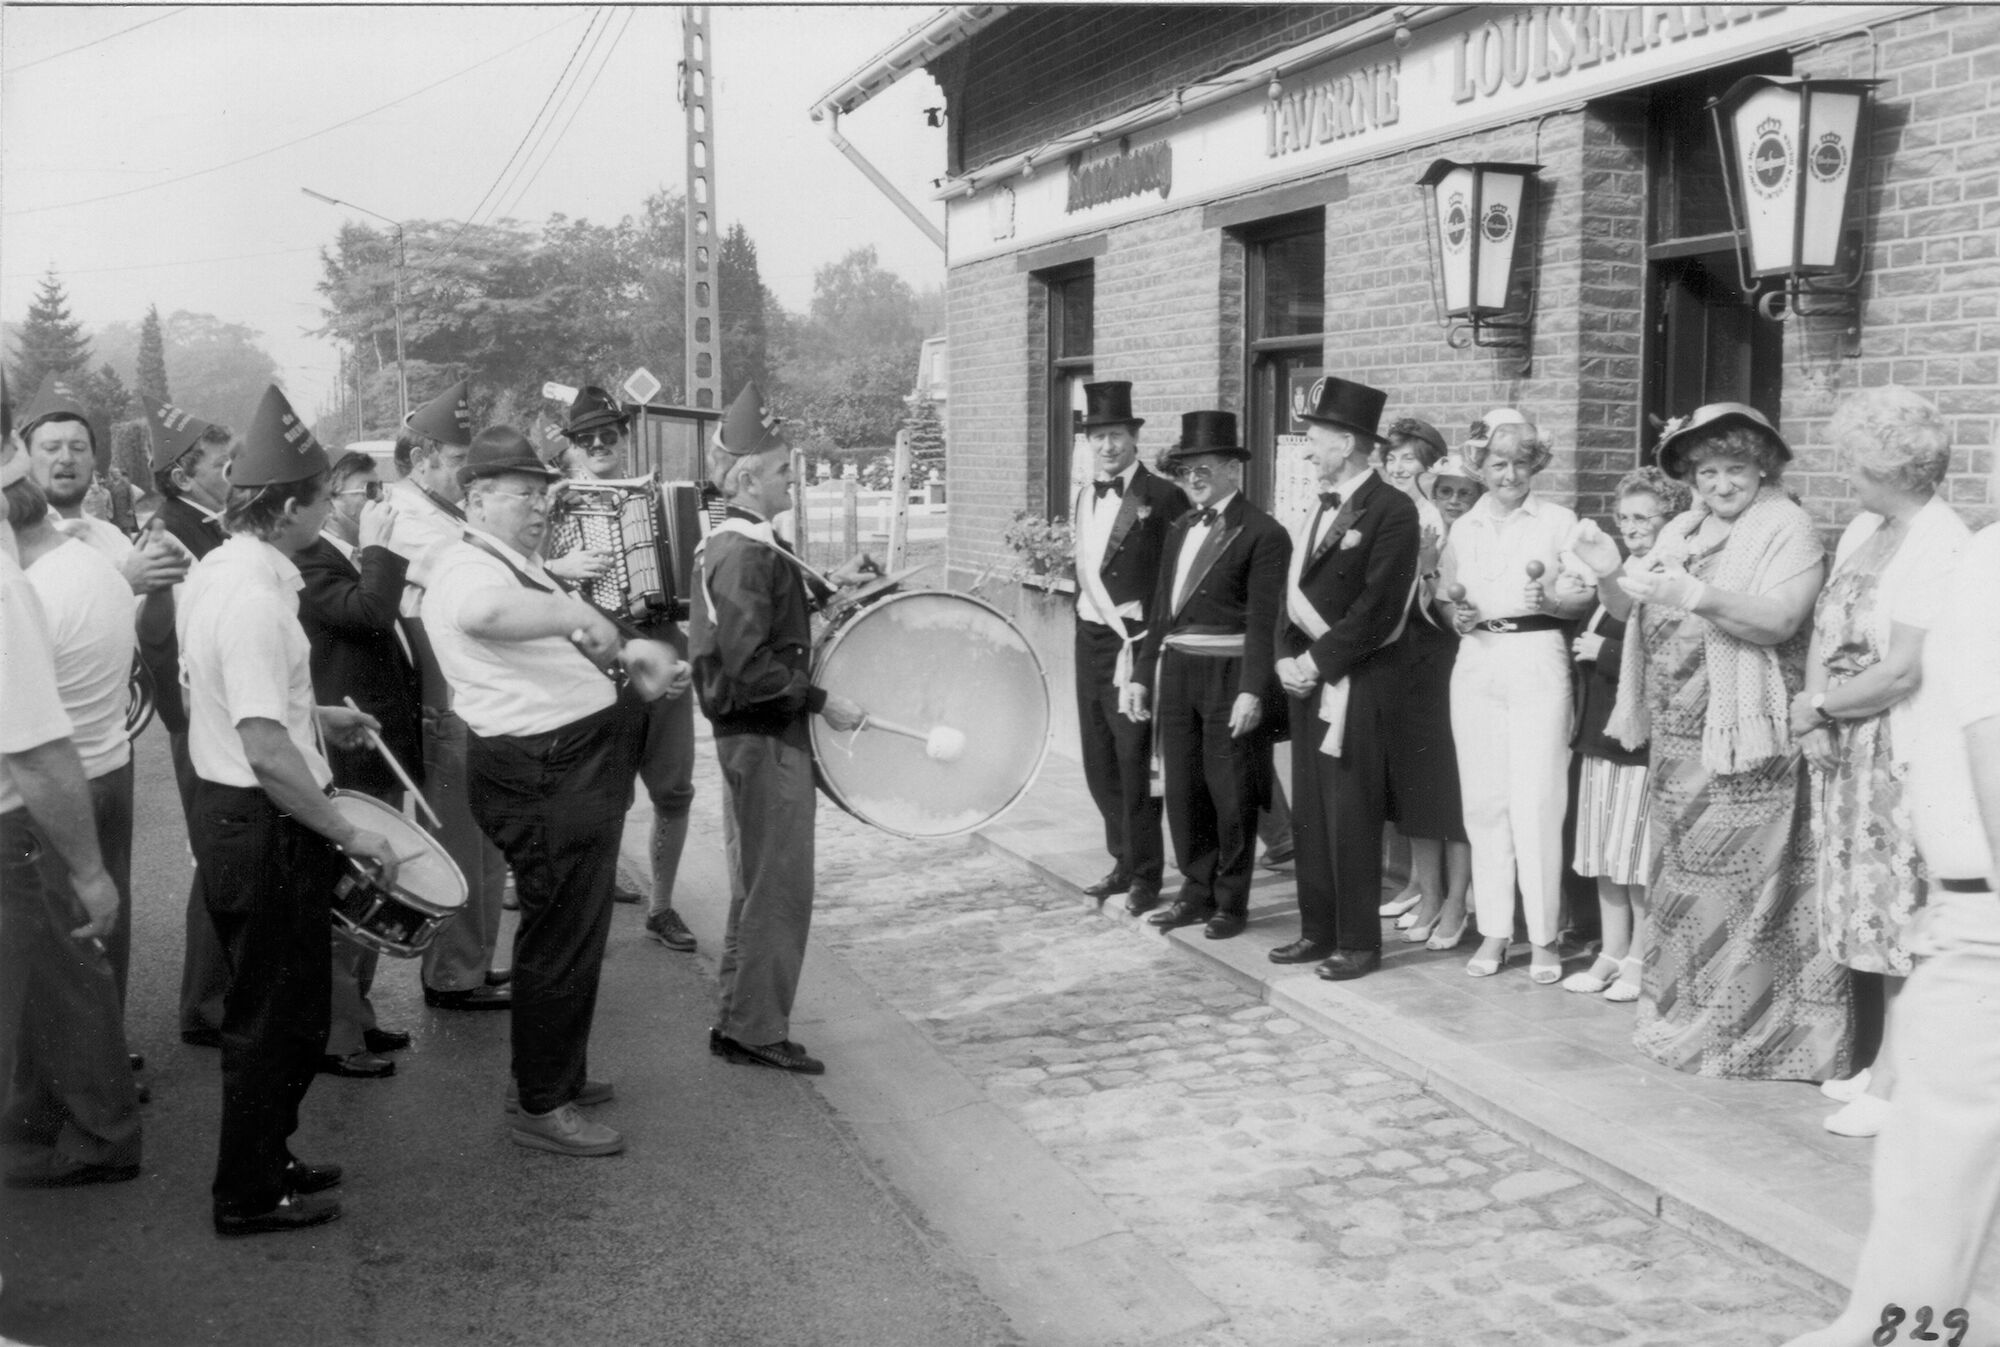 Lousie Marie: de Bierfluiters op kermismaandag